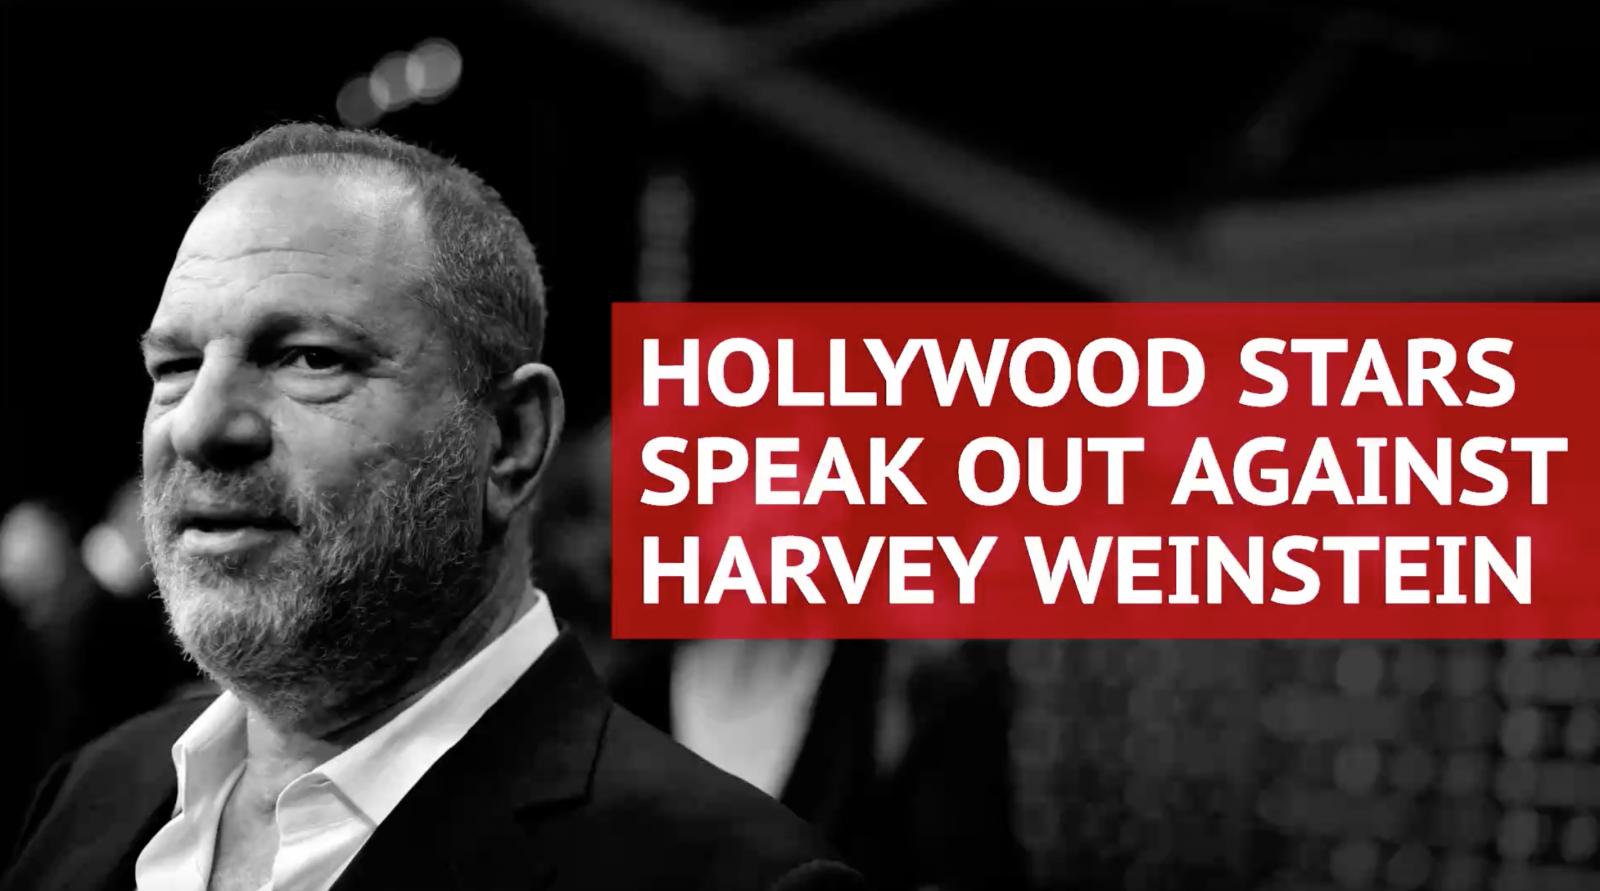 george-clooney-meryl-streep-to-jennifer-lawrence-hollywood-stars-speak-out-against-harvey-weinstein